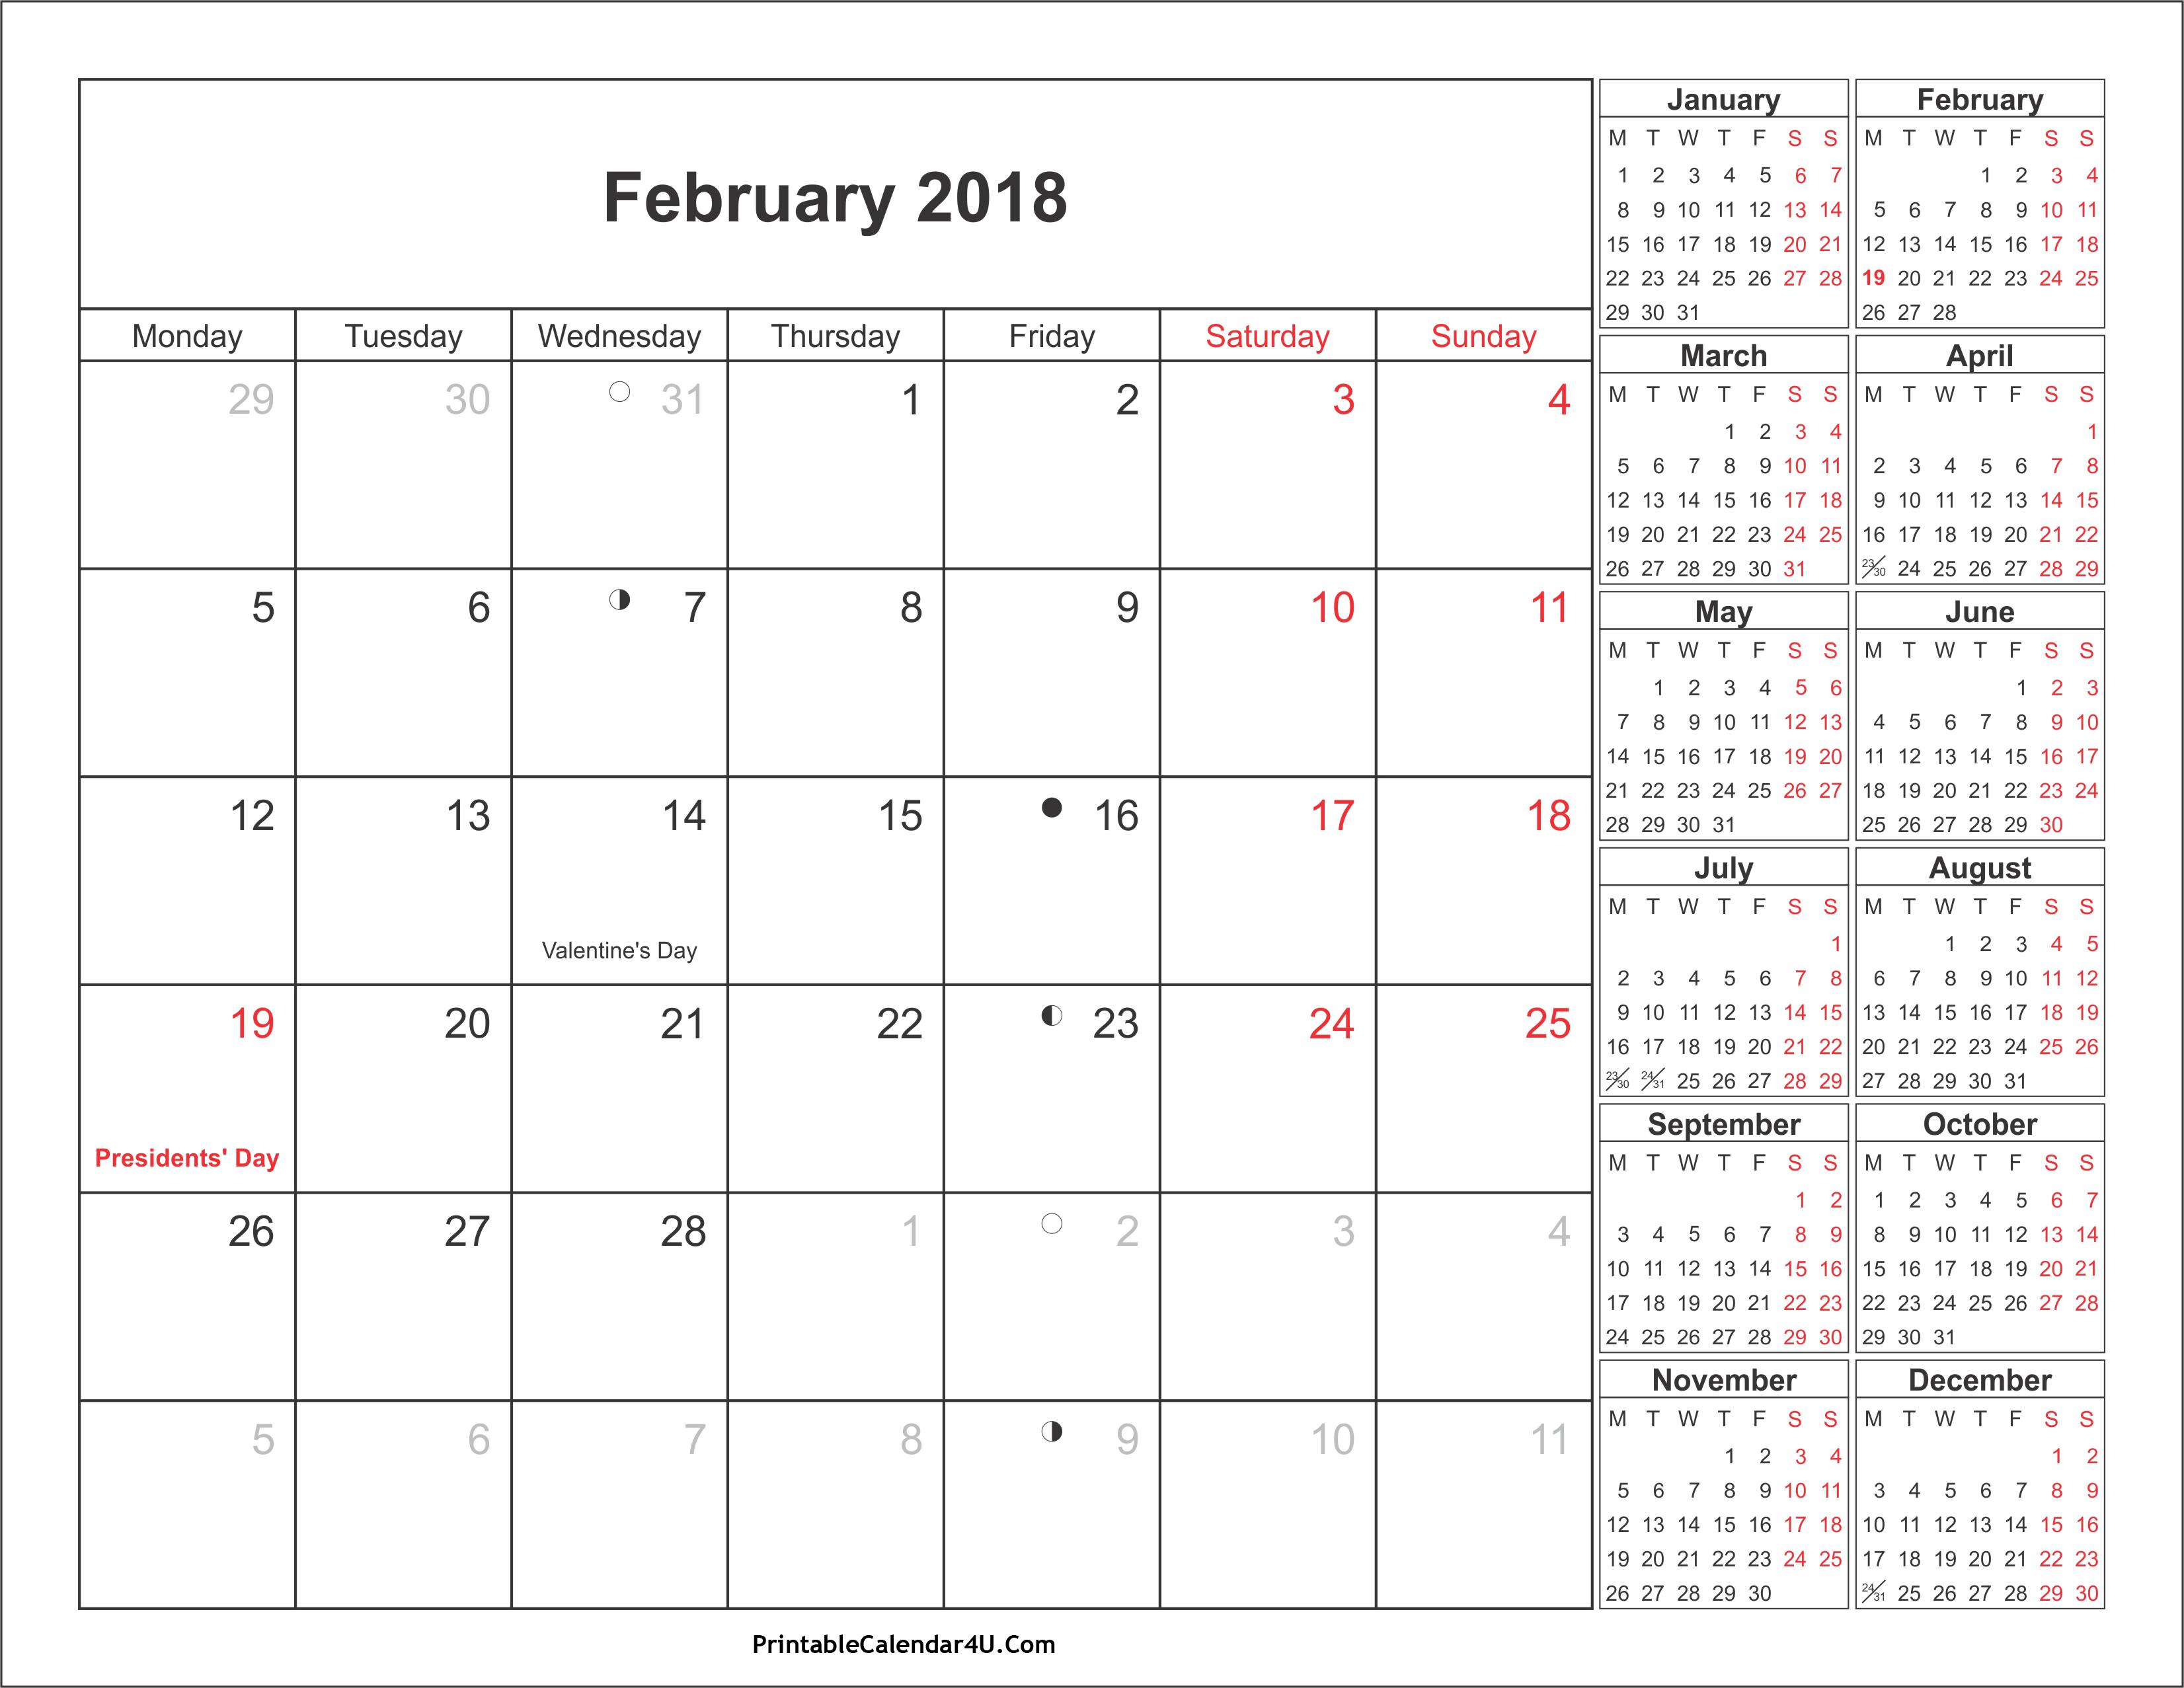 February 2018 Calendar With Holidays 2018 calendar printable 3304x2554